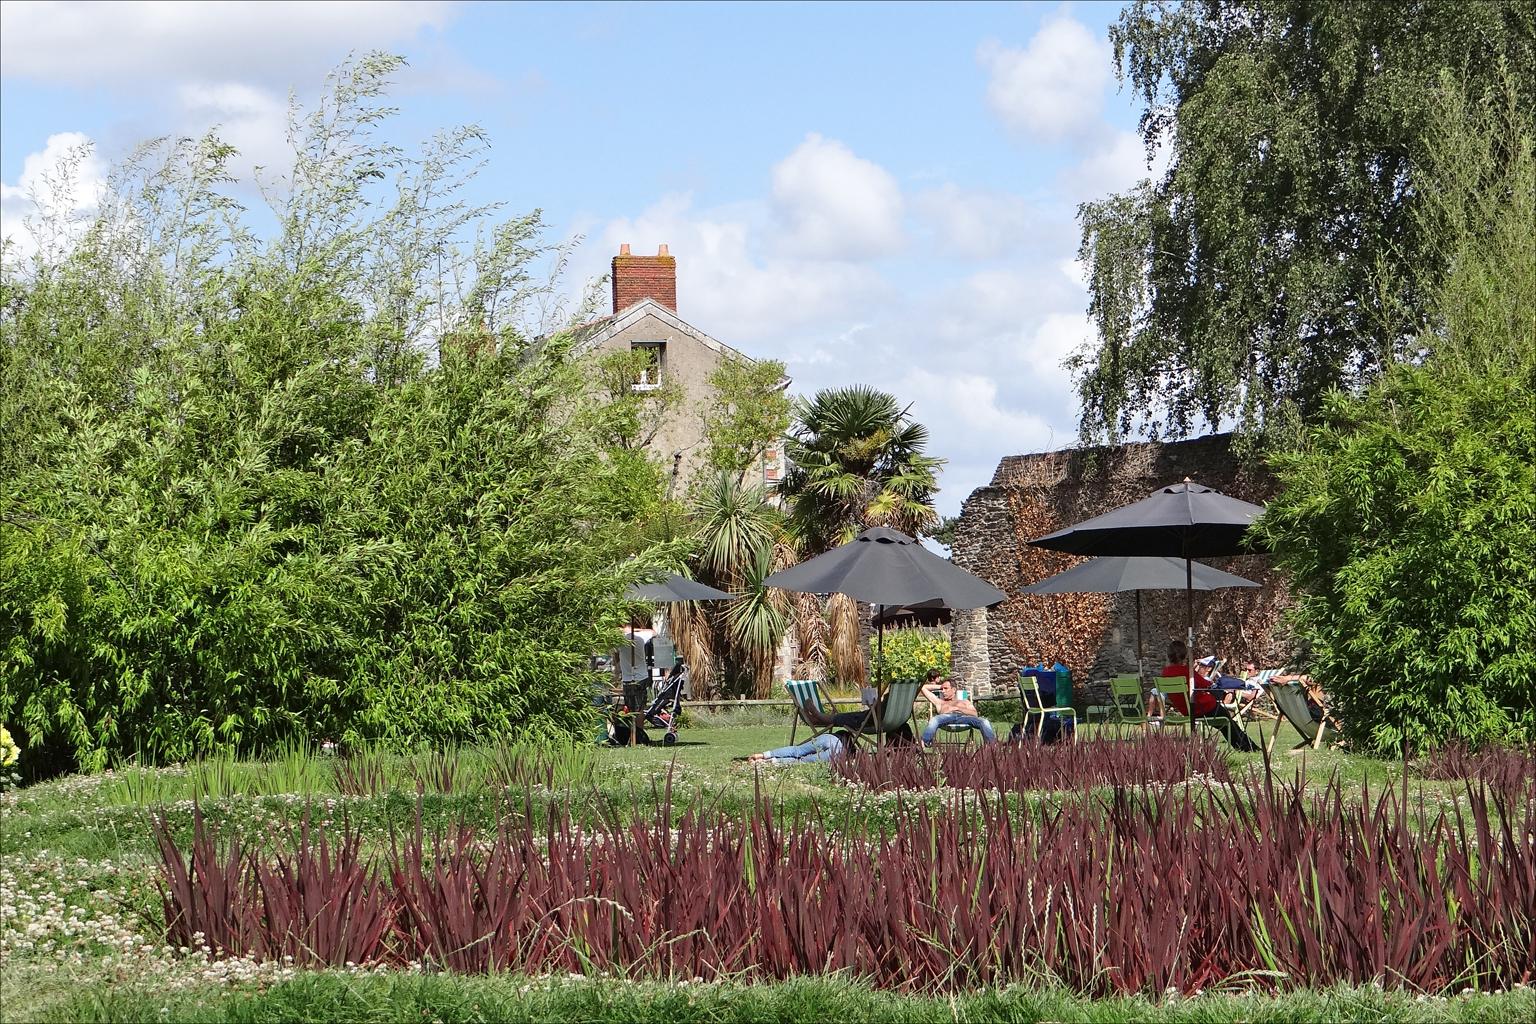 File:Le Jardin des Plantes (Nantes).jpg - Wikimedia Commons